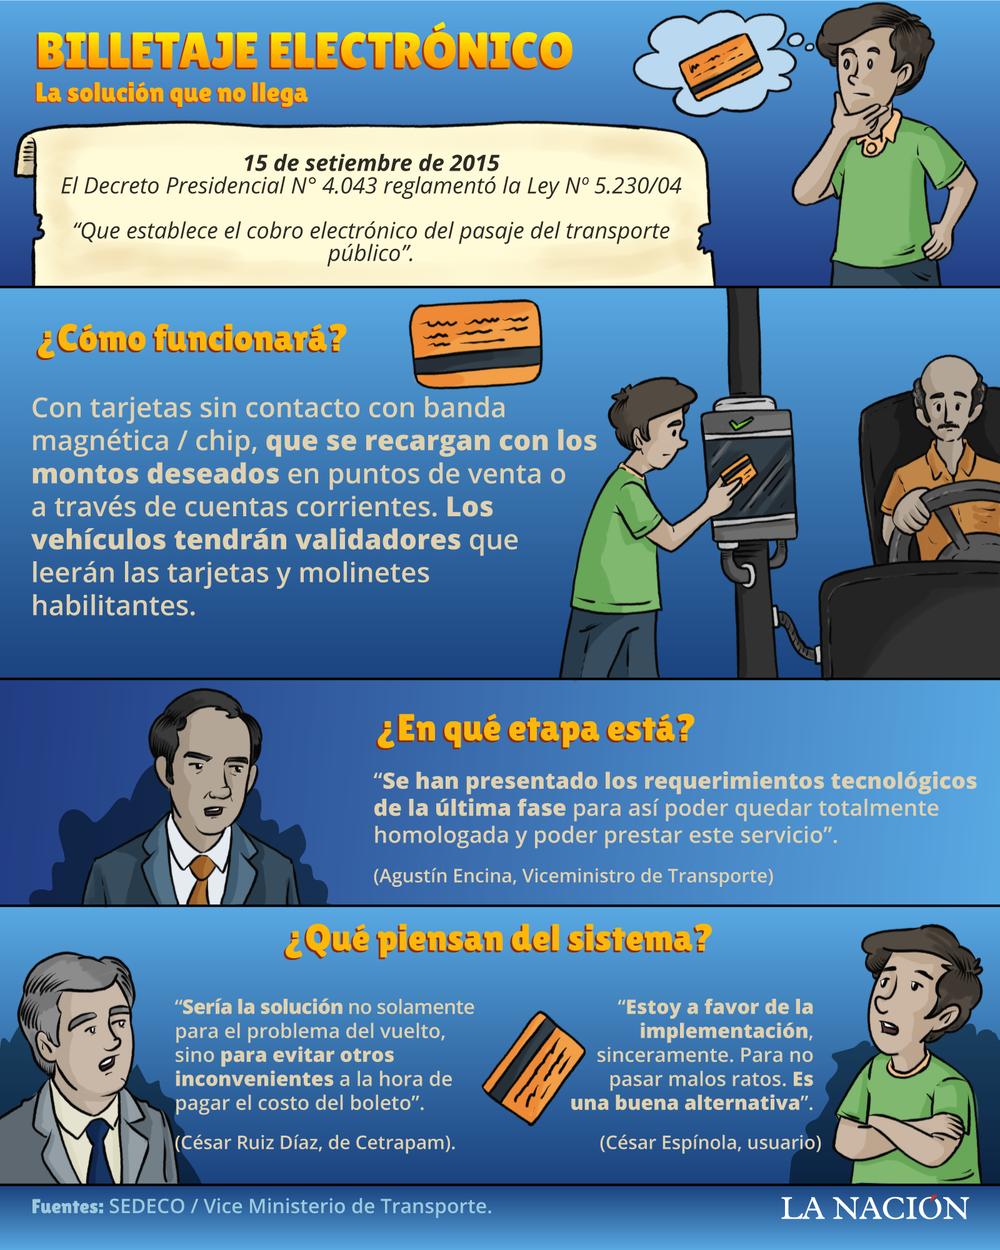 6-boleto-electronico.png